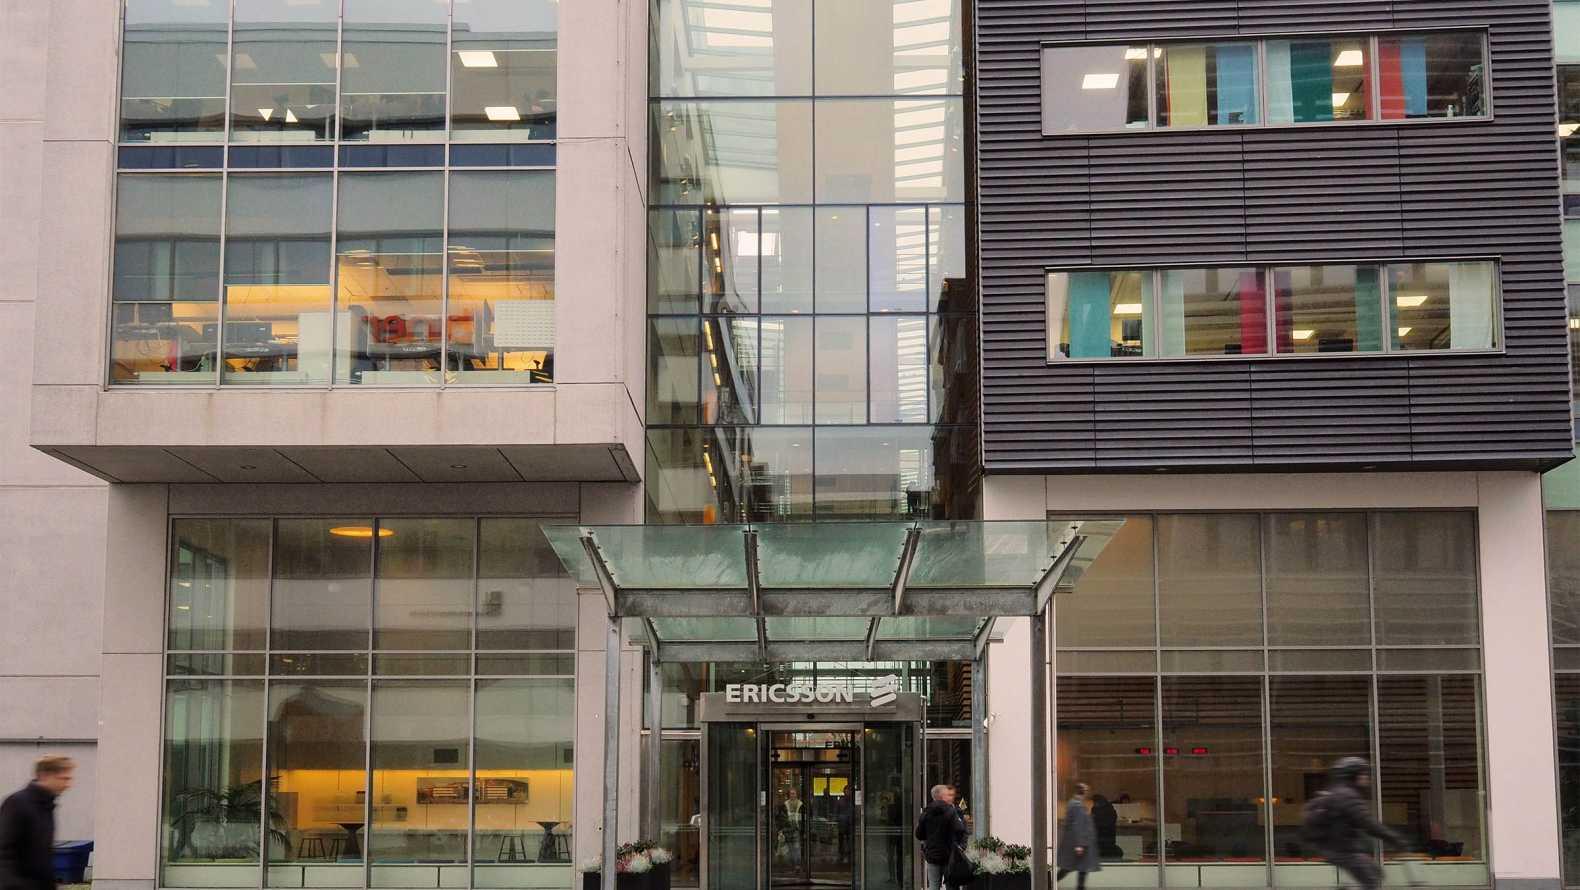 Facade Ericsson Lindholmspiren 11 AI Innovation of Sweden